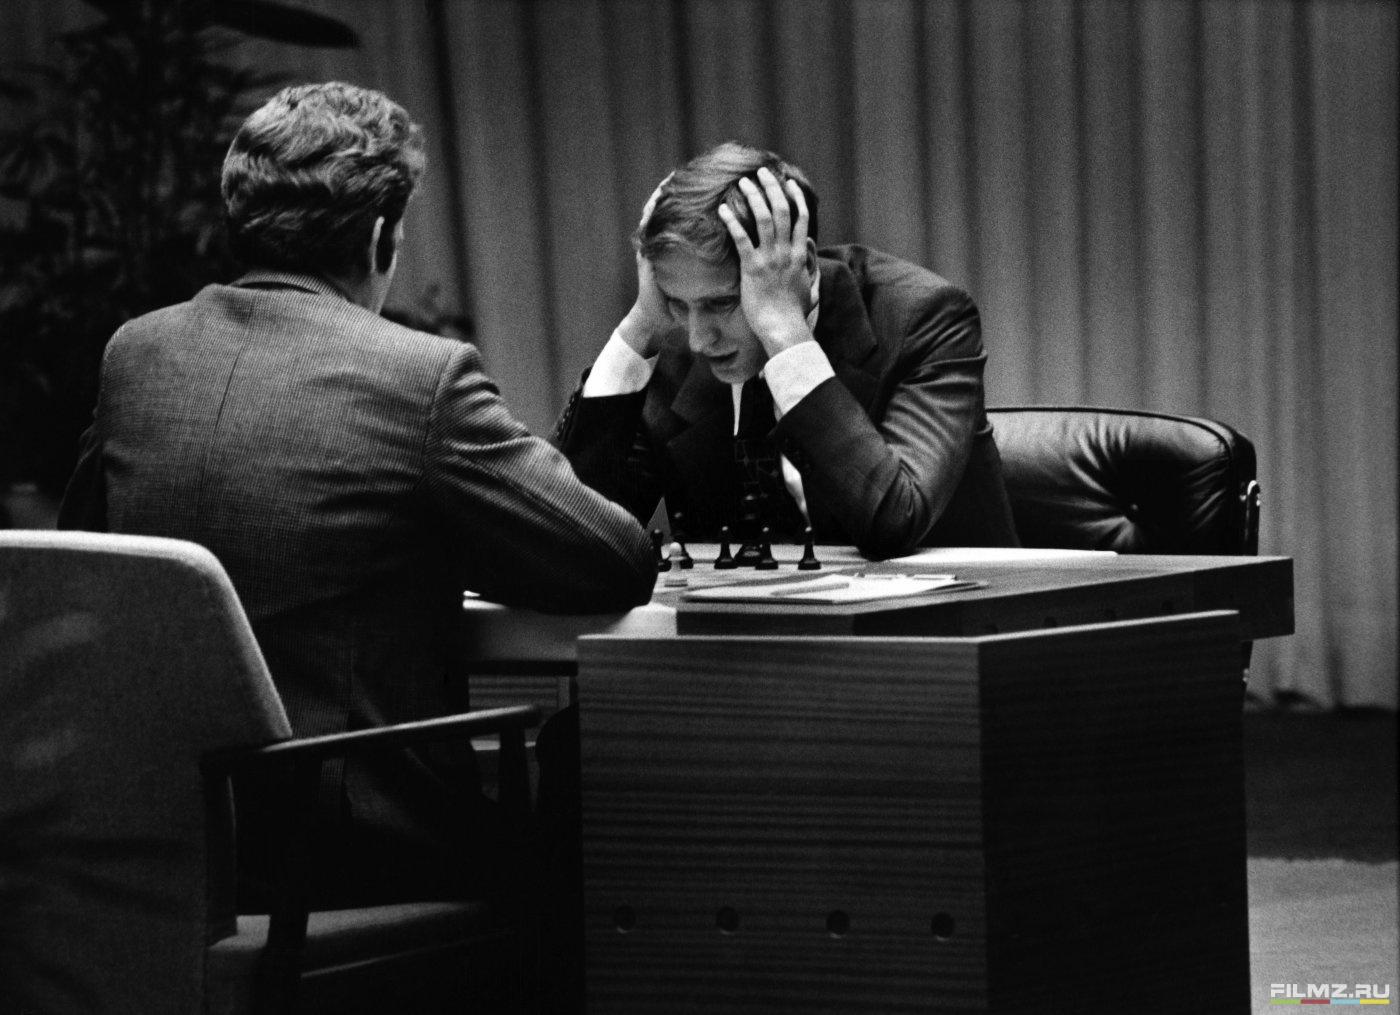 кадры из фильма Бобби Фишер против всего мира Бобби Фишер,